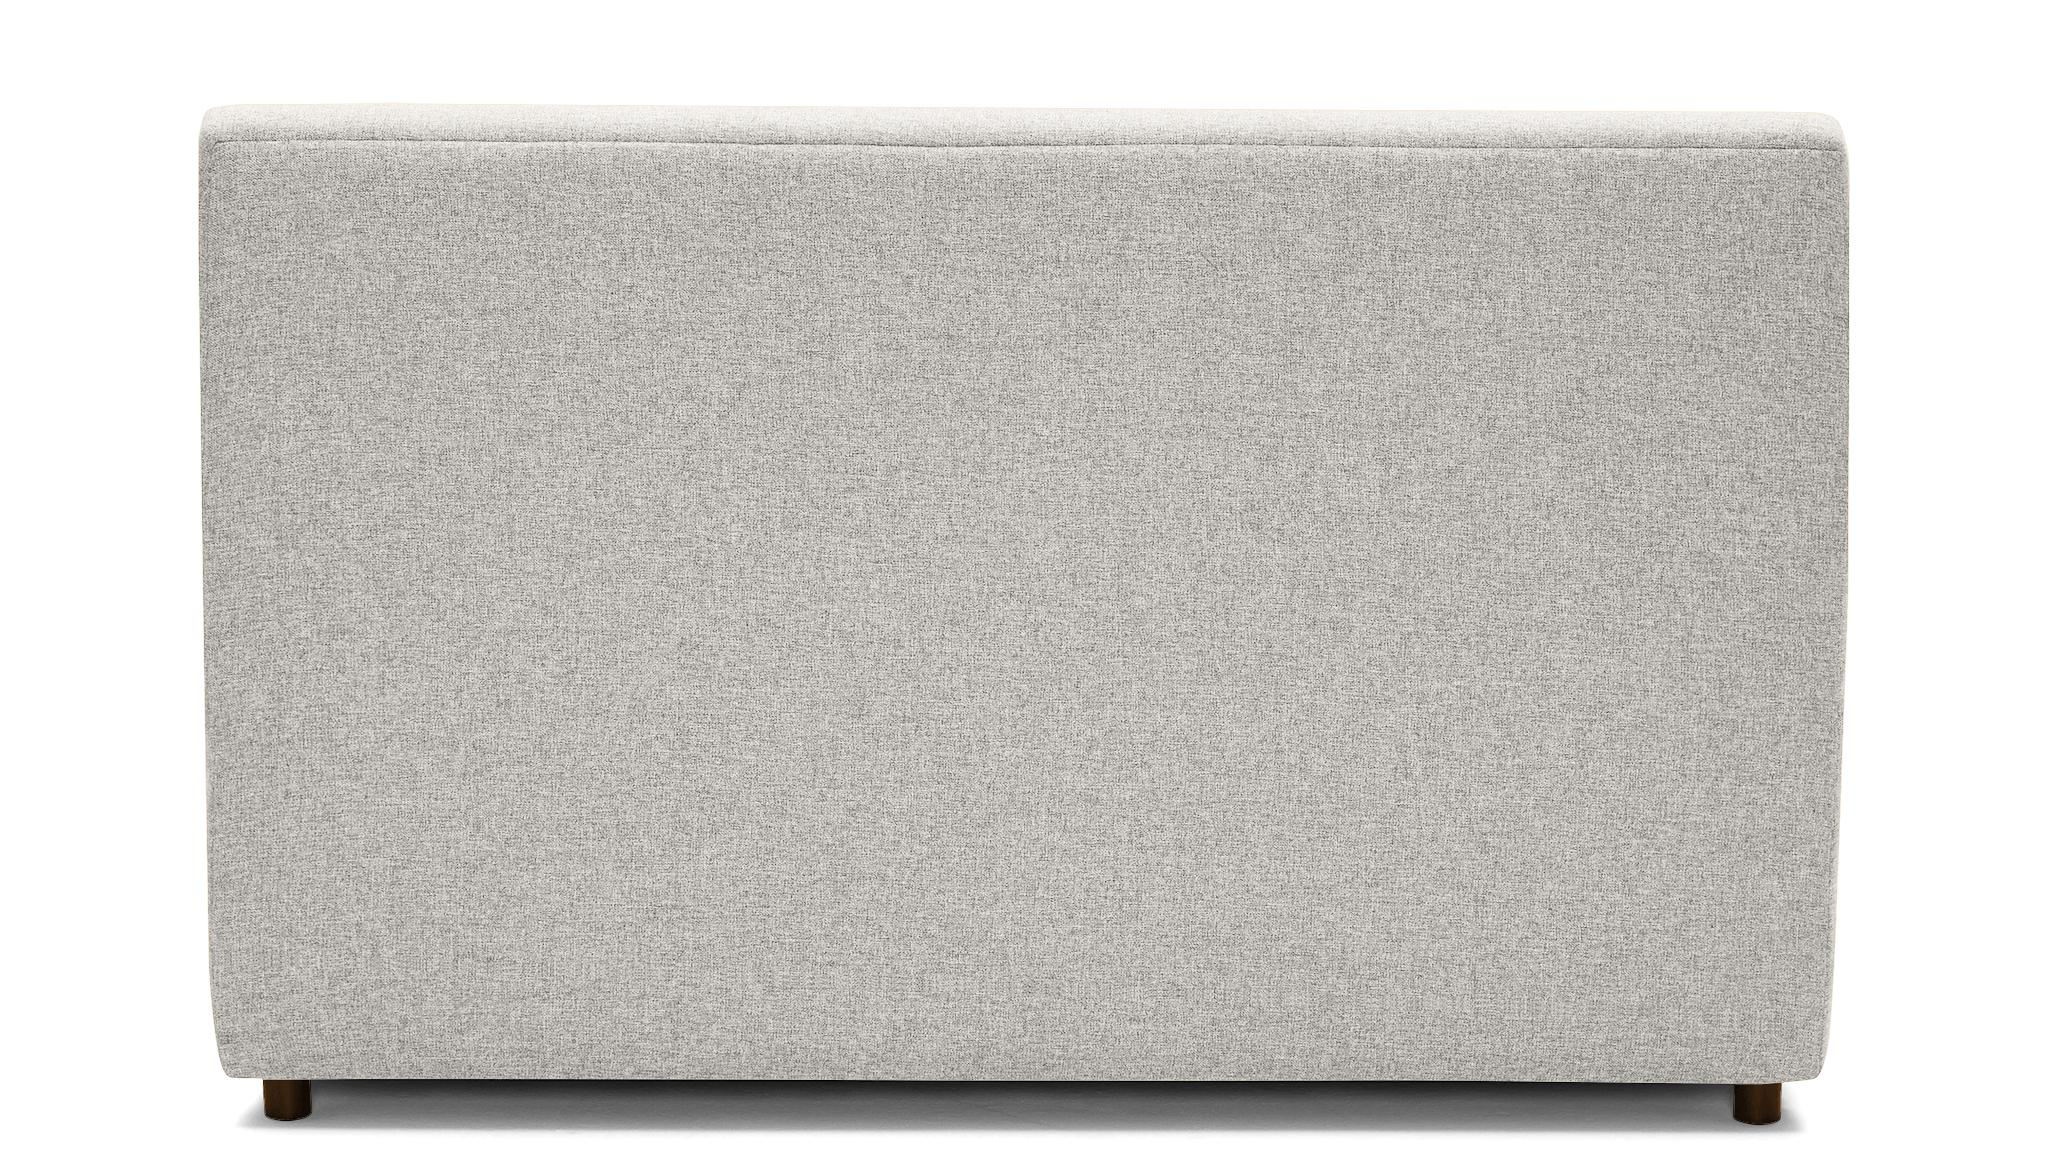 White Alvin Mid Century Modern Storage Bed - Tussah Snow - Mocha - Eastern King